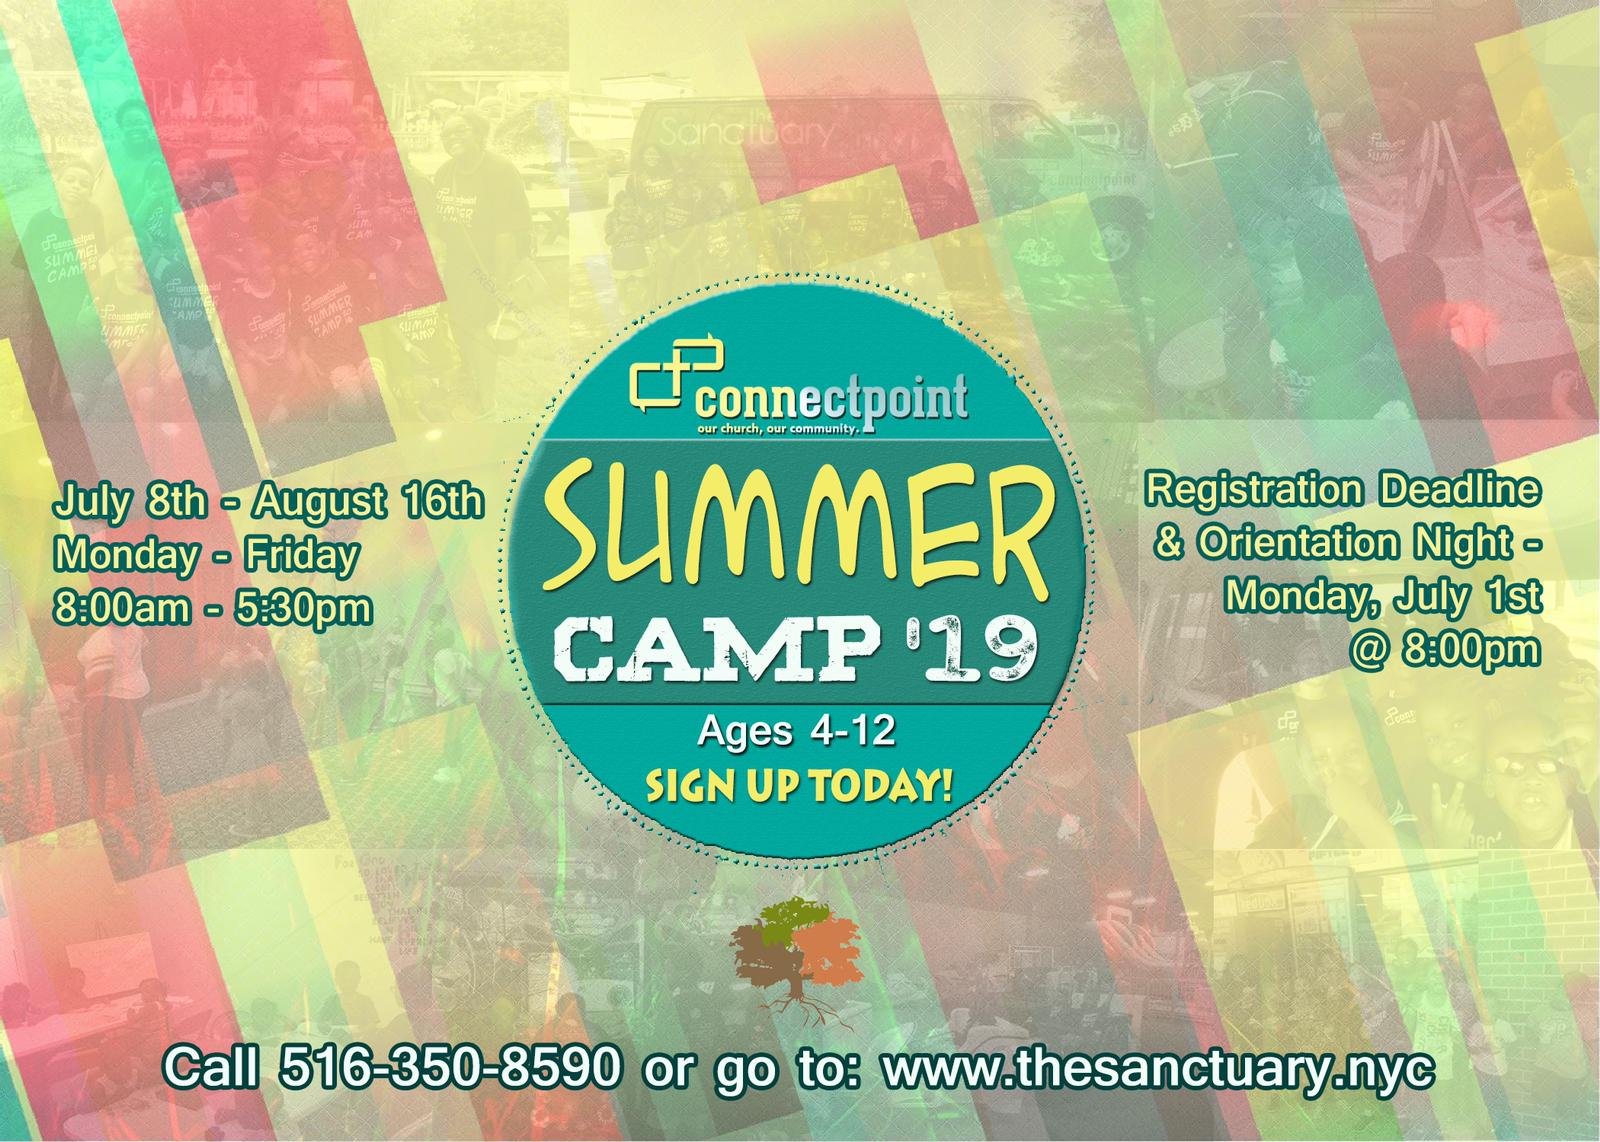 SummerCamp19.jpeg